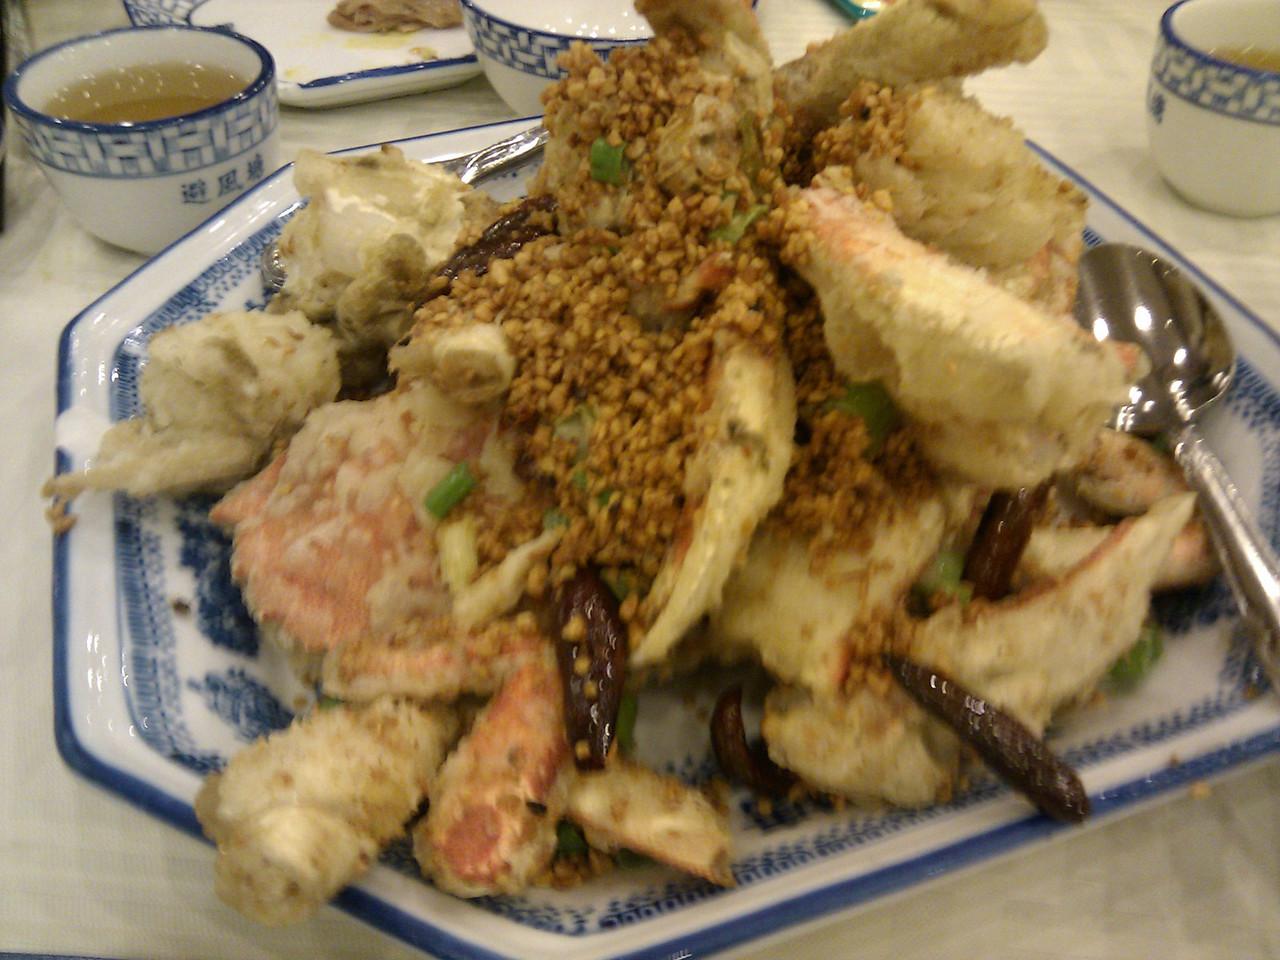 Seafood Village R.H. - House Crab